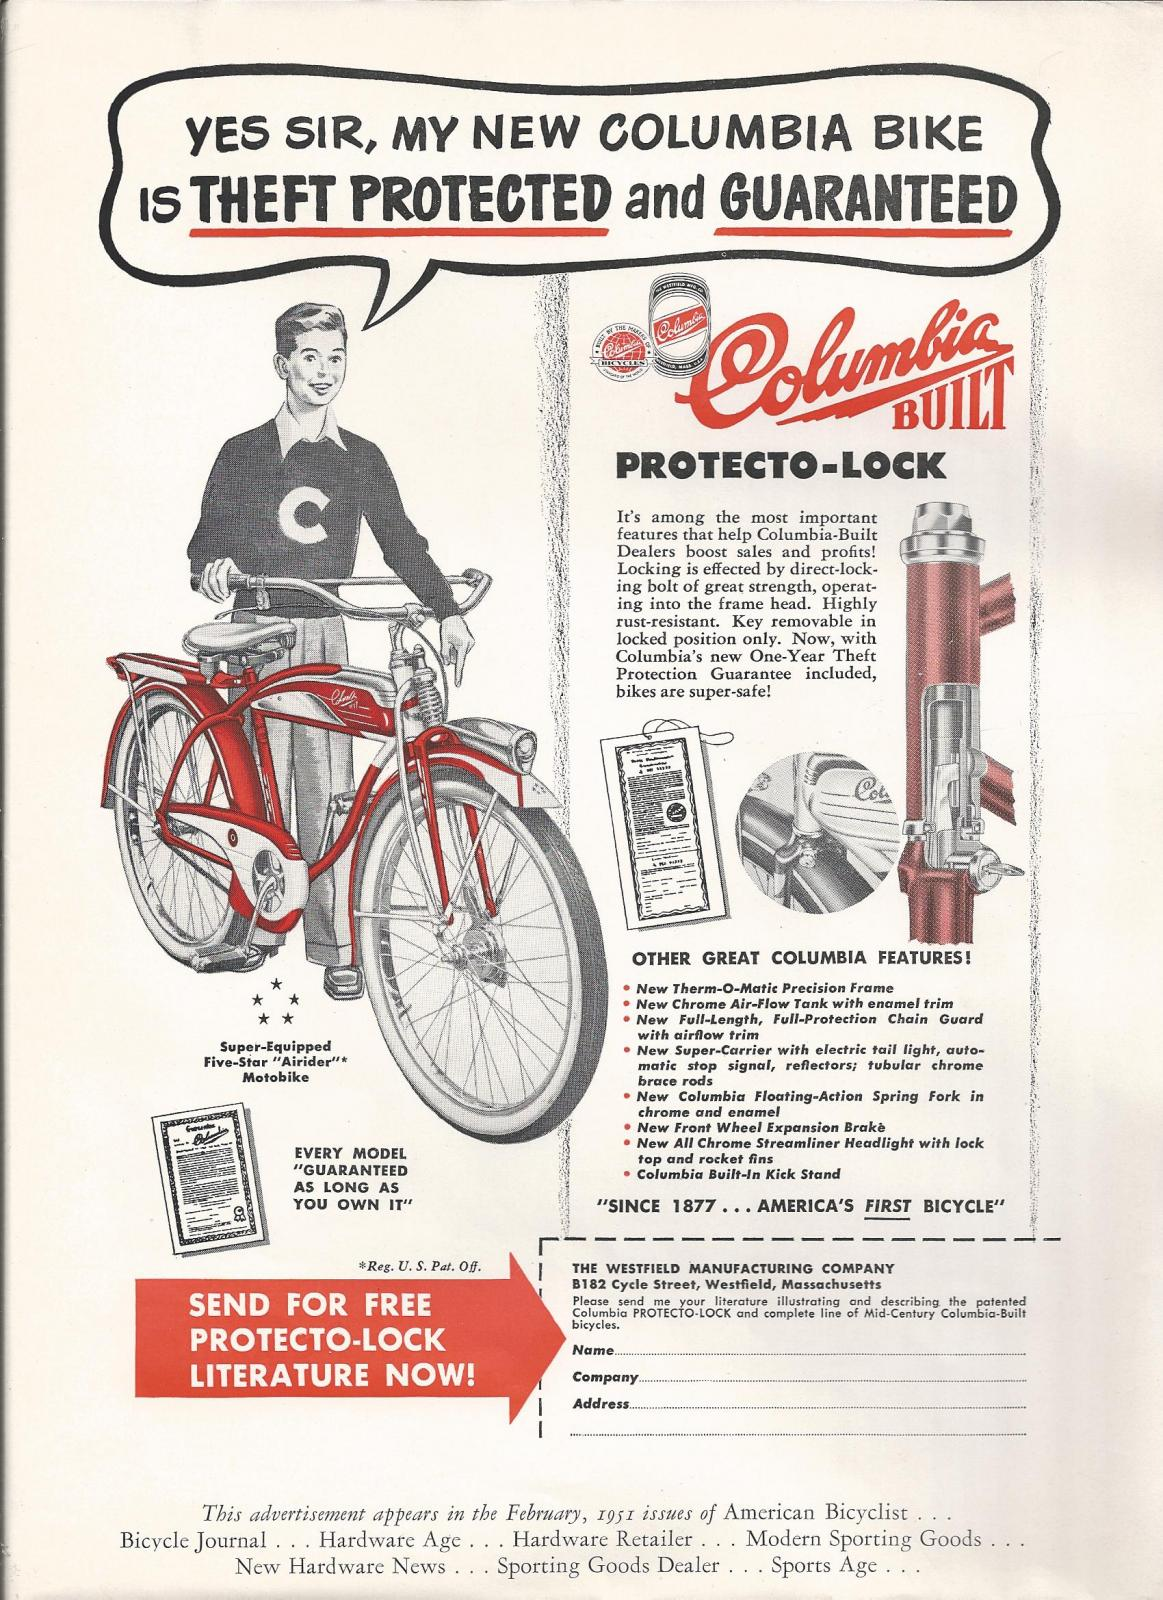 1951 Theft Proteced and Guaranteed.jpg